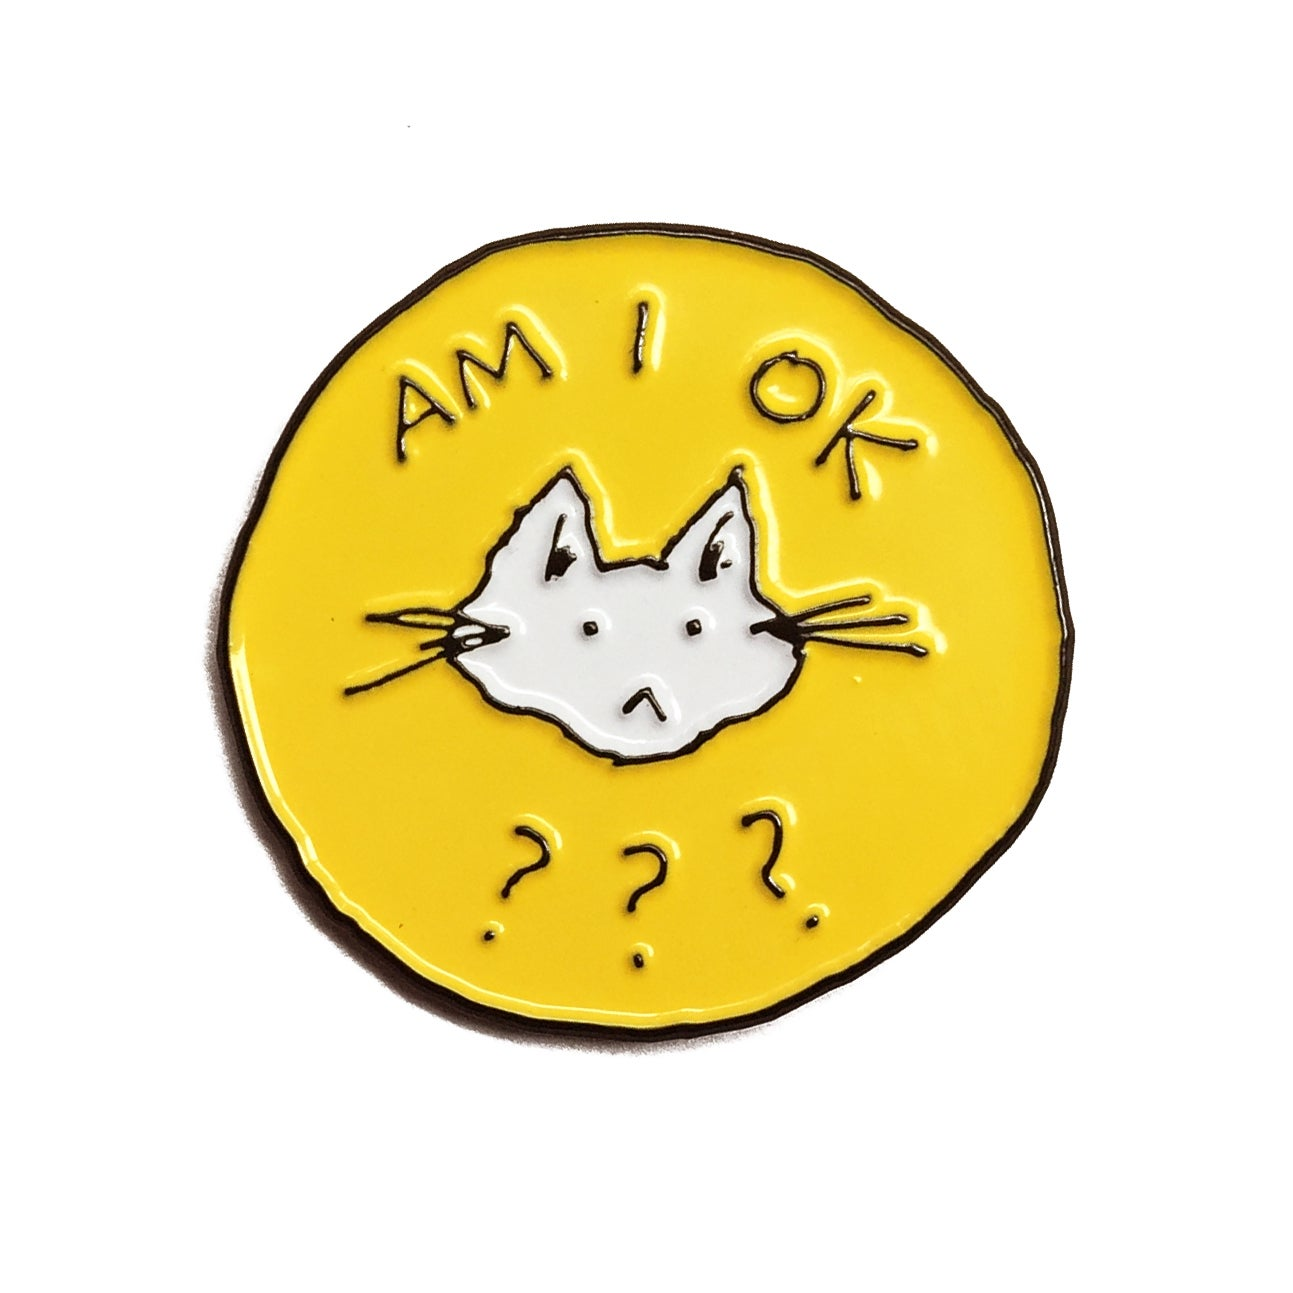 Am I ok??? Enamel pin